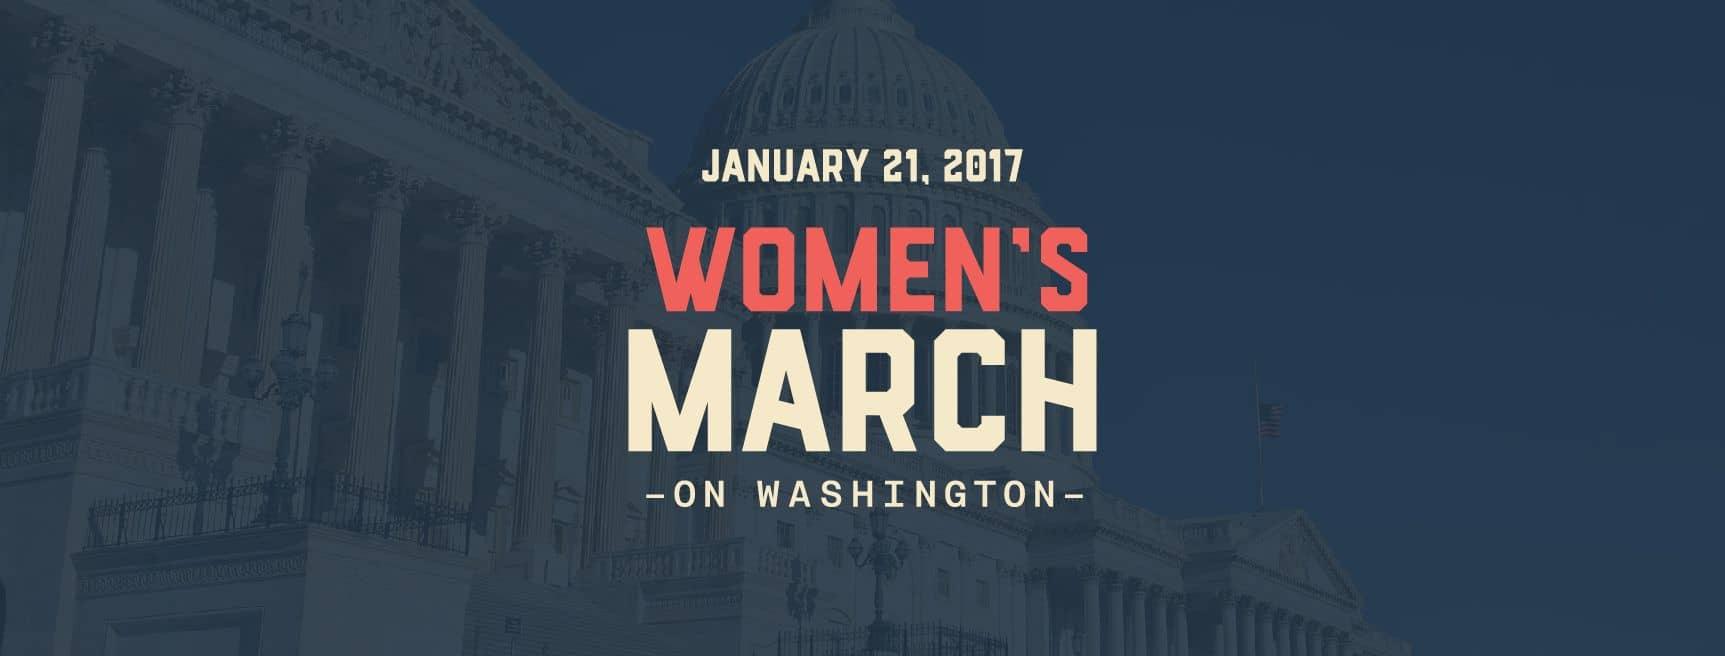 Women's march on Washington ワシントン女性の権利デモ行進